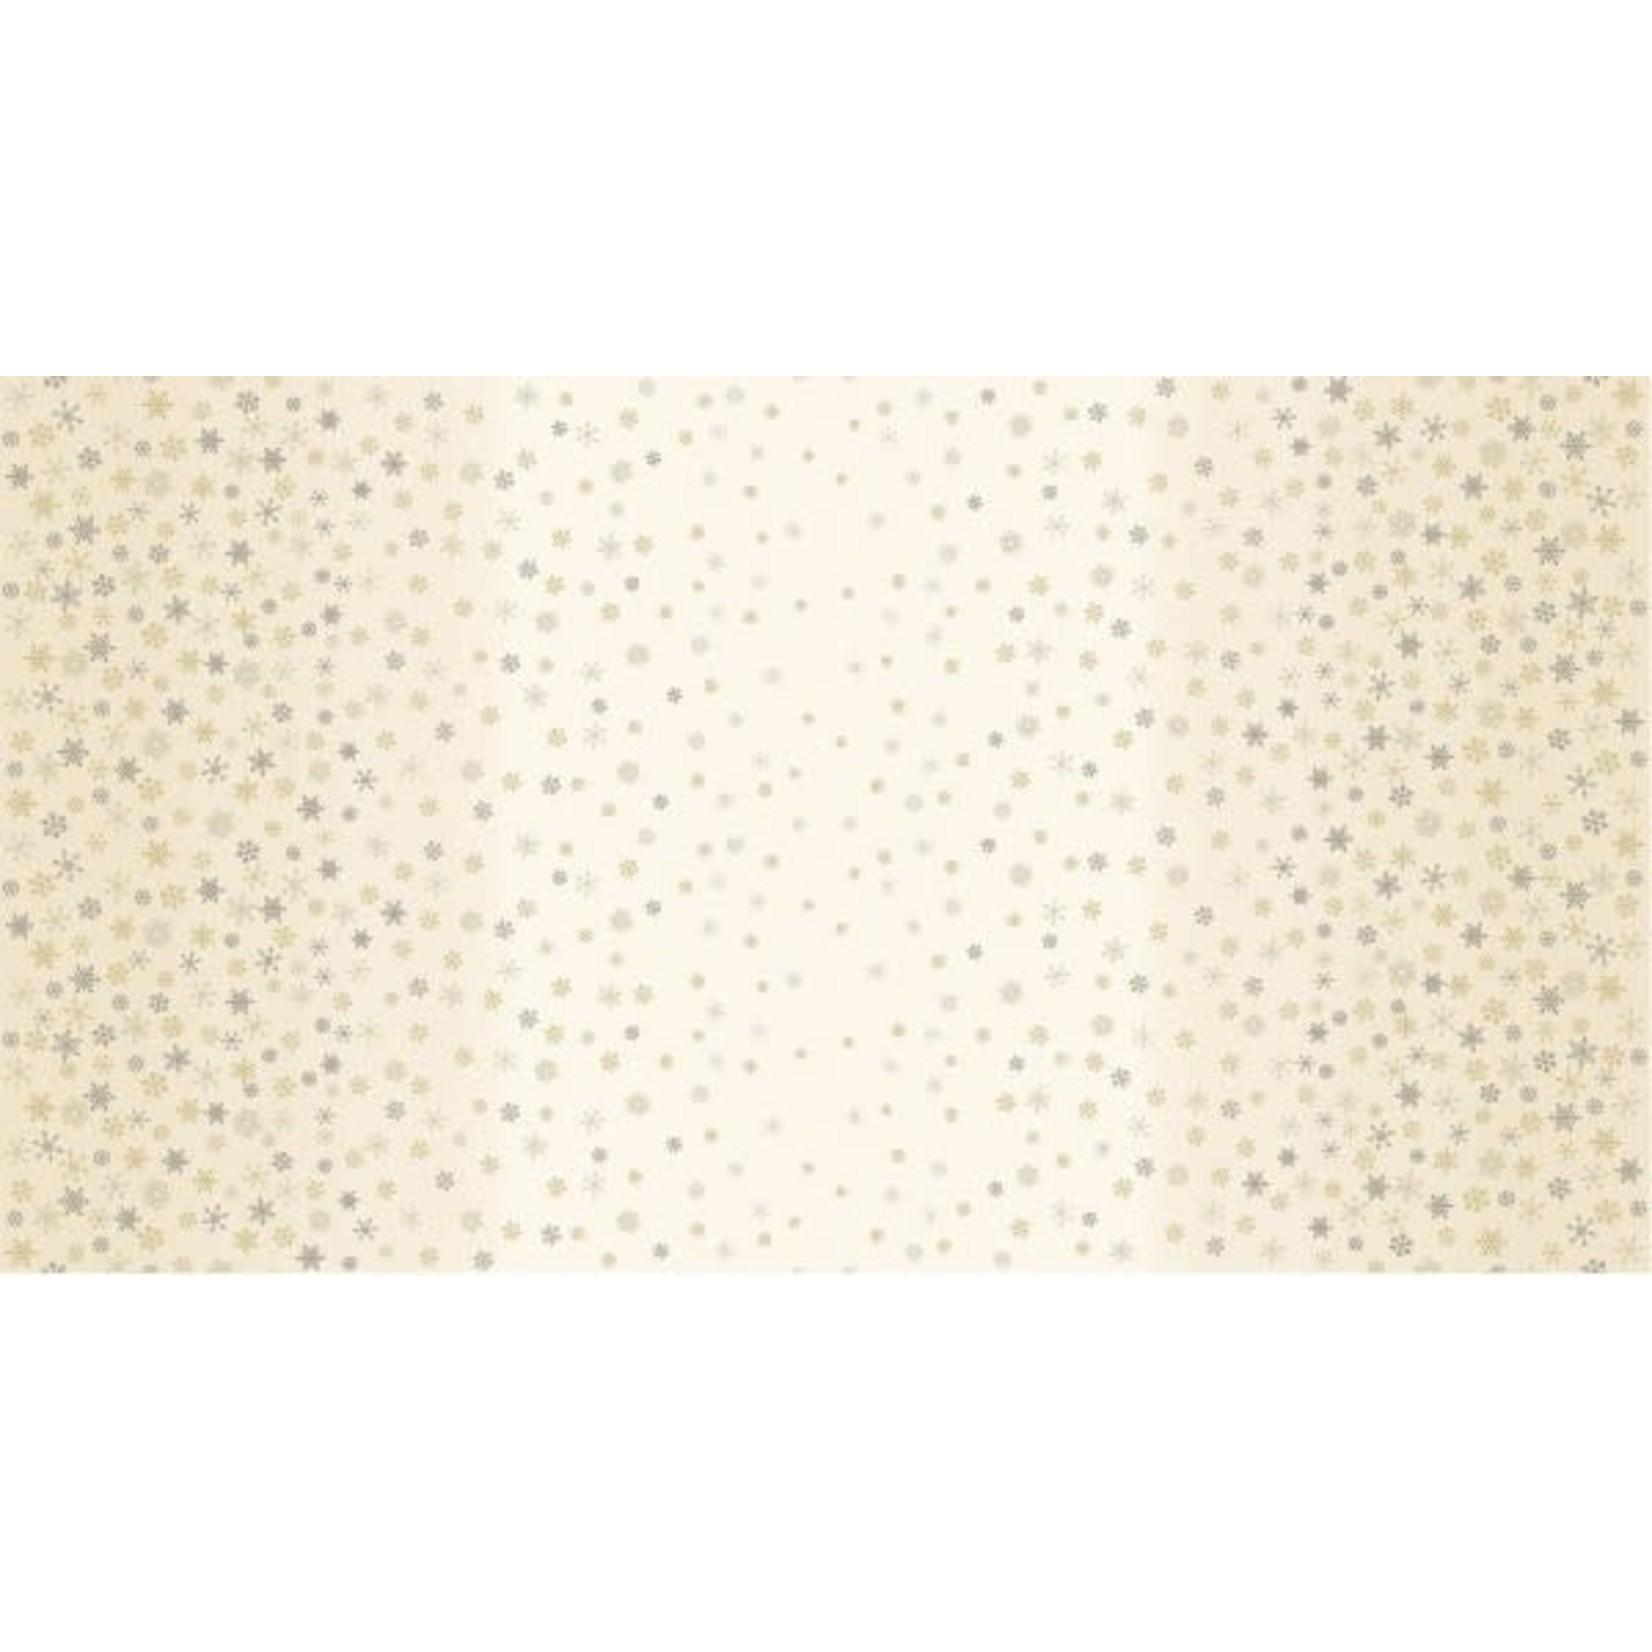 MAKOWER Snowflake, Ombré, Cream, per cm or $20/m